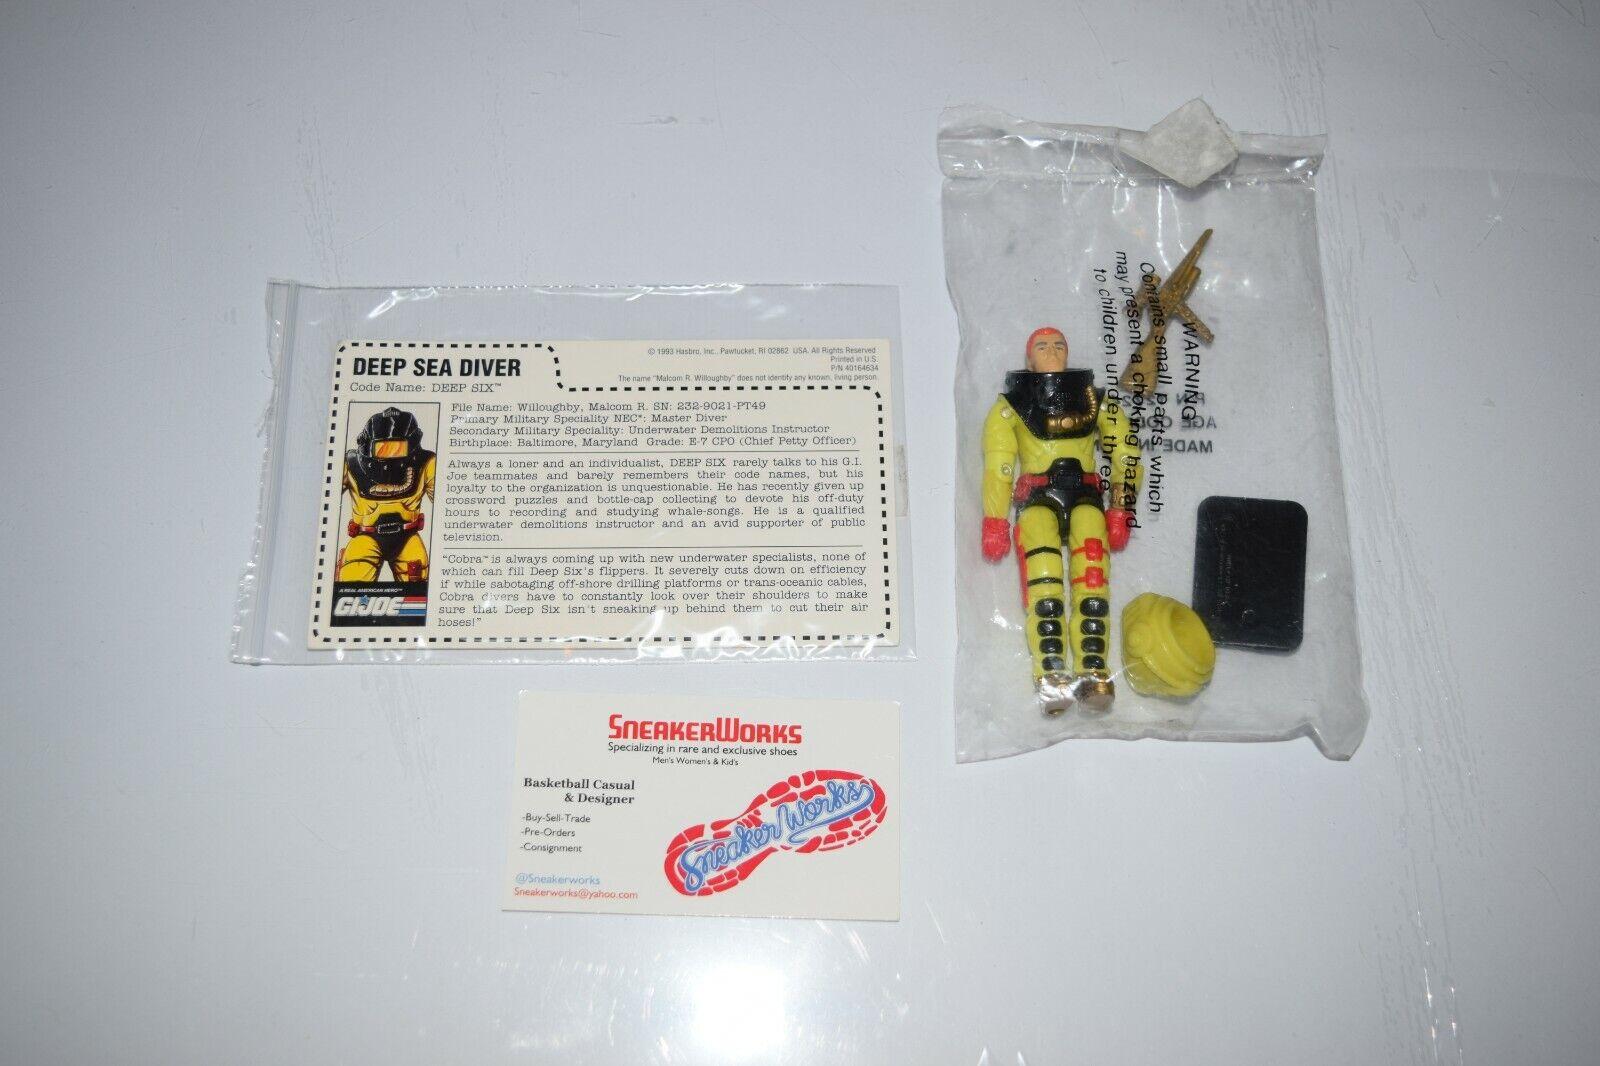 New Vintage Hasbro GI Joe Deep Six Action Figure 1993 Mail-In ARAH Complete